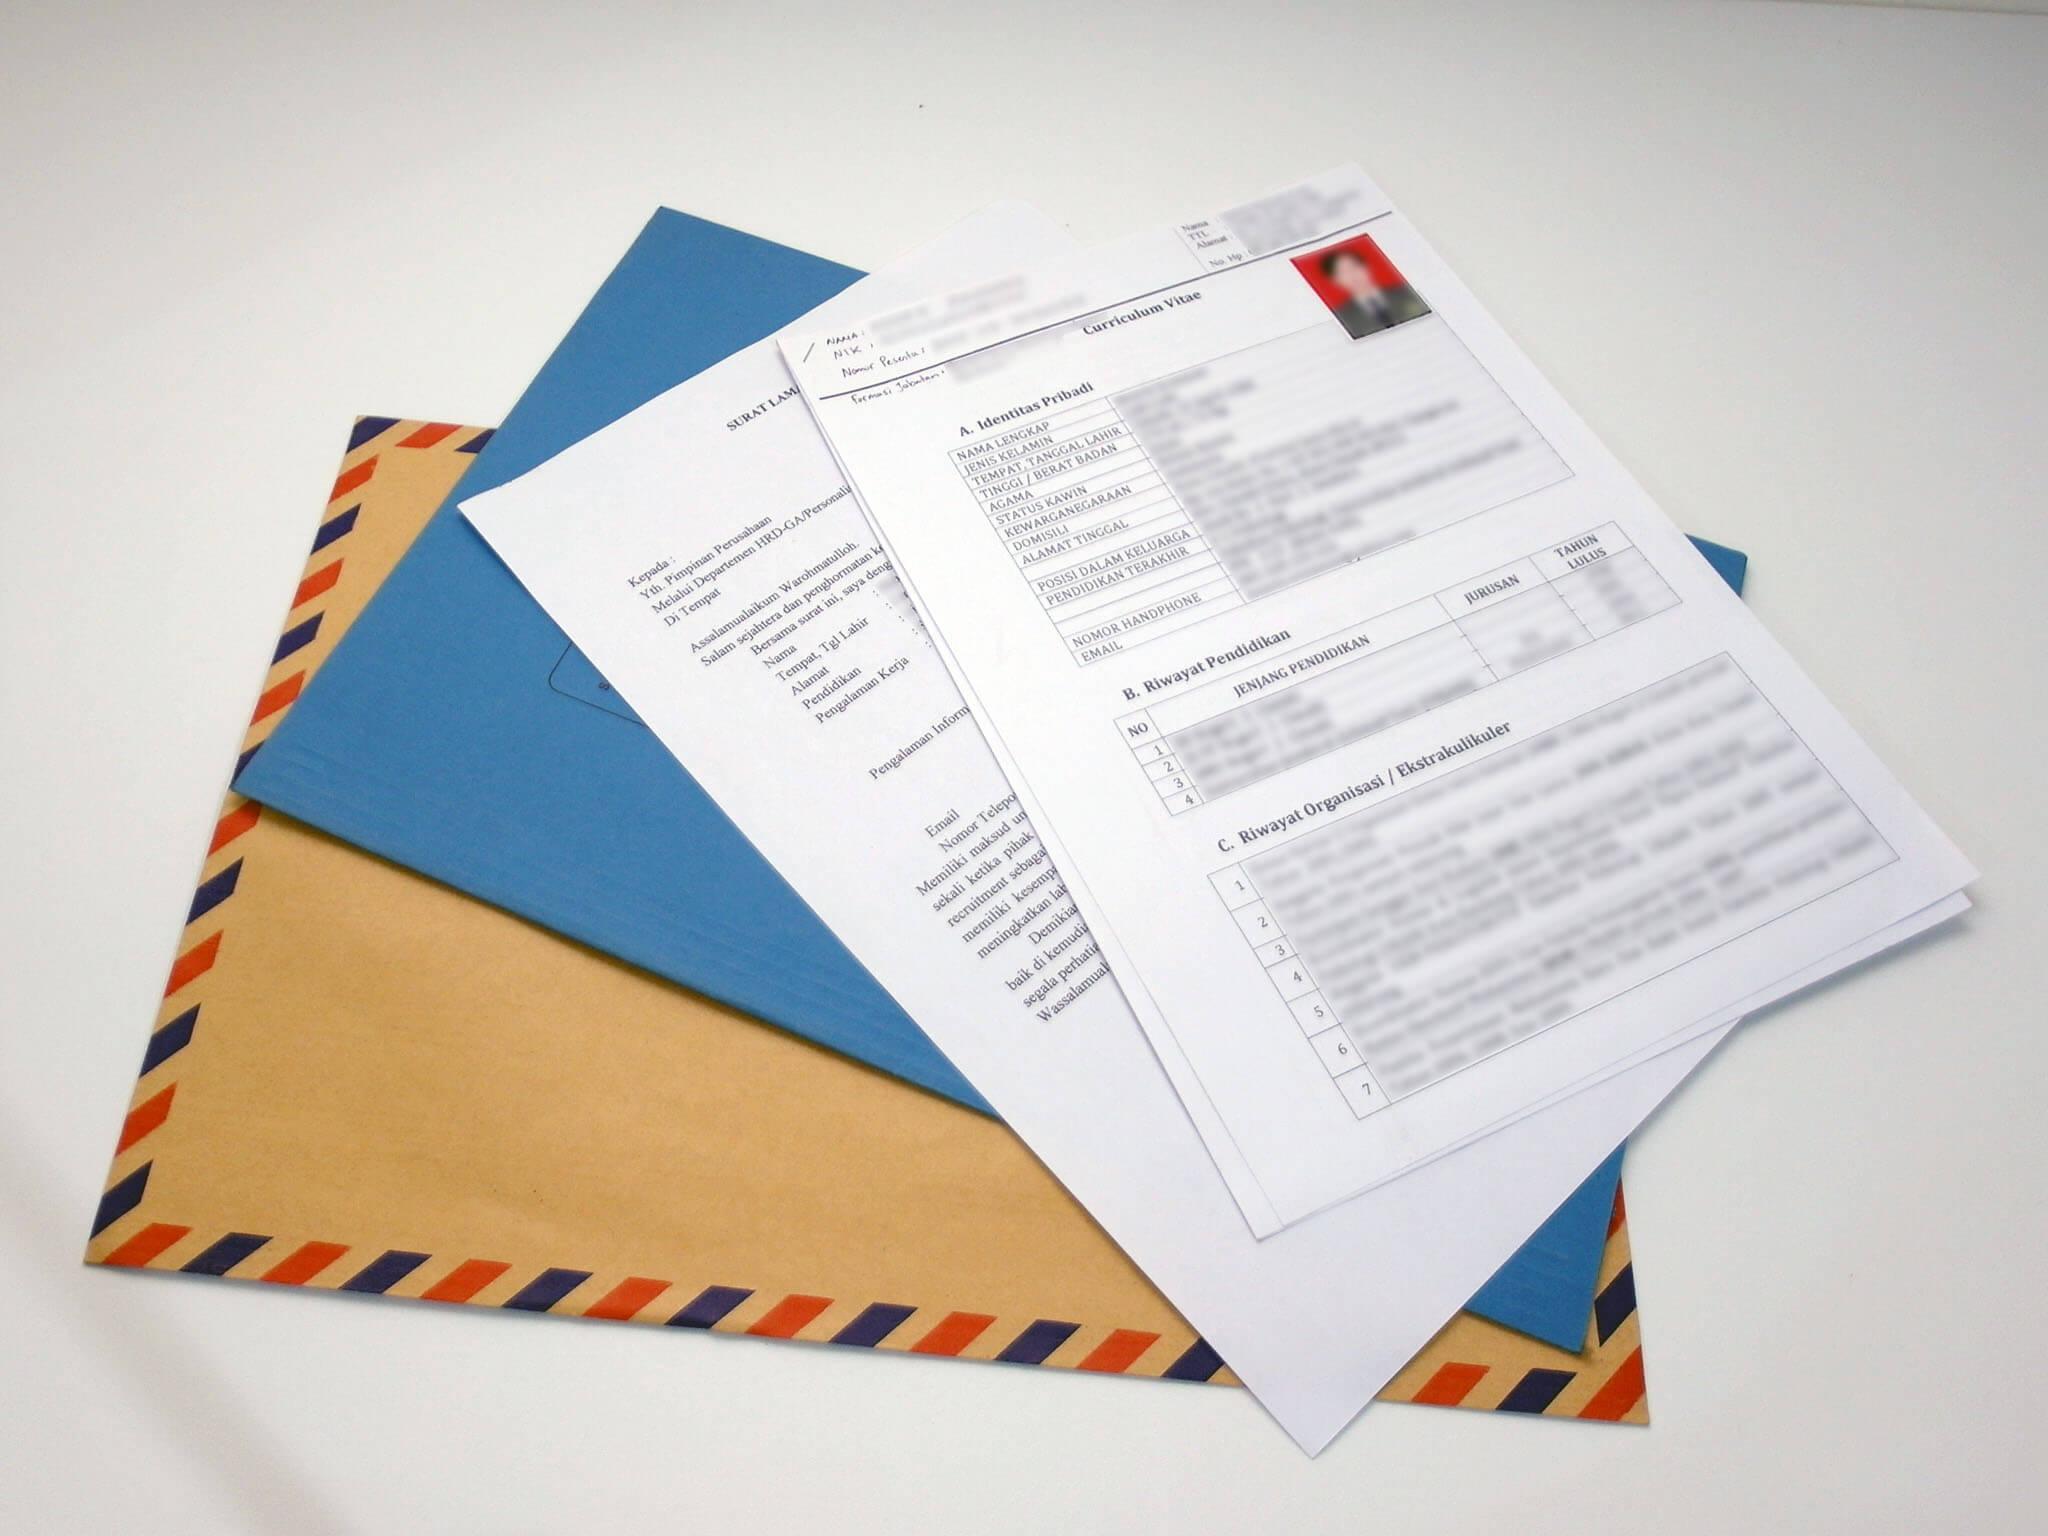 Penting Ini Contoh Surat Lamaran Kerja Yang Harus Diperhatikan Pelamar